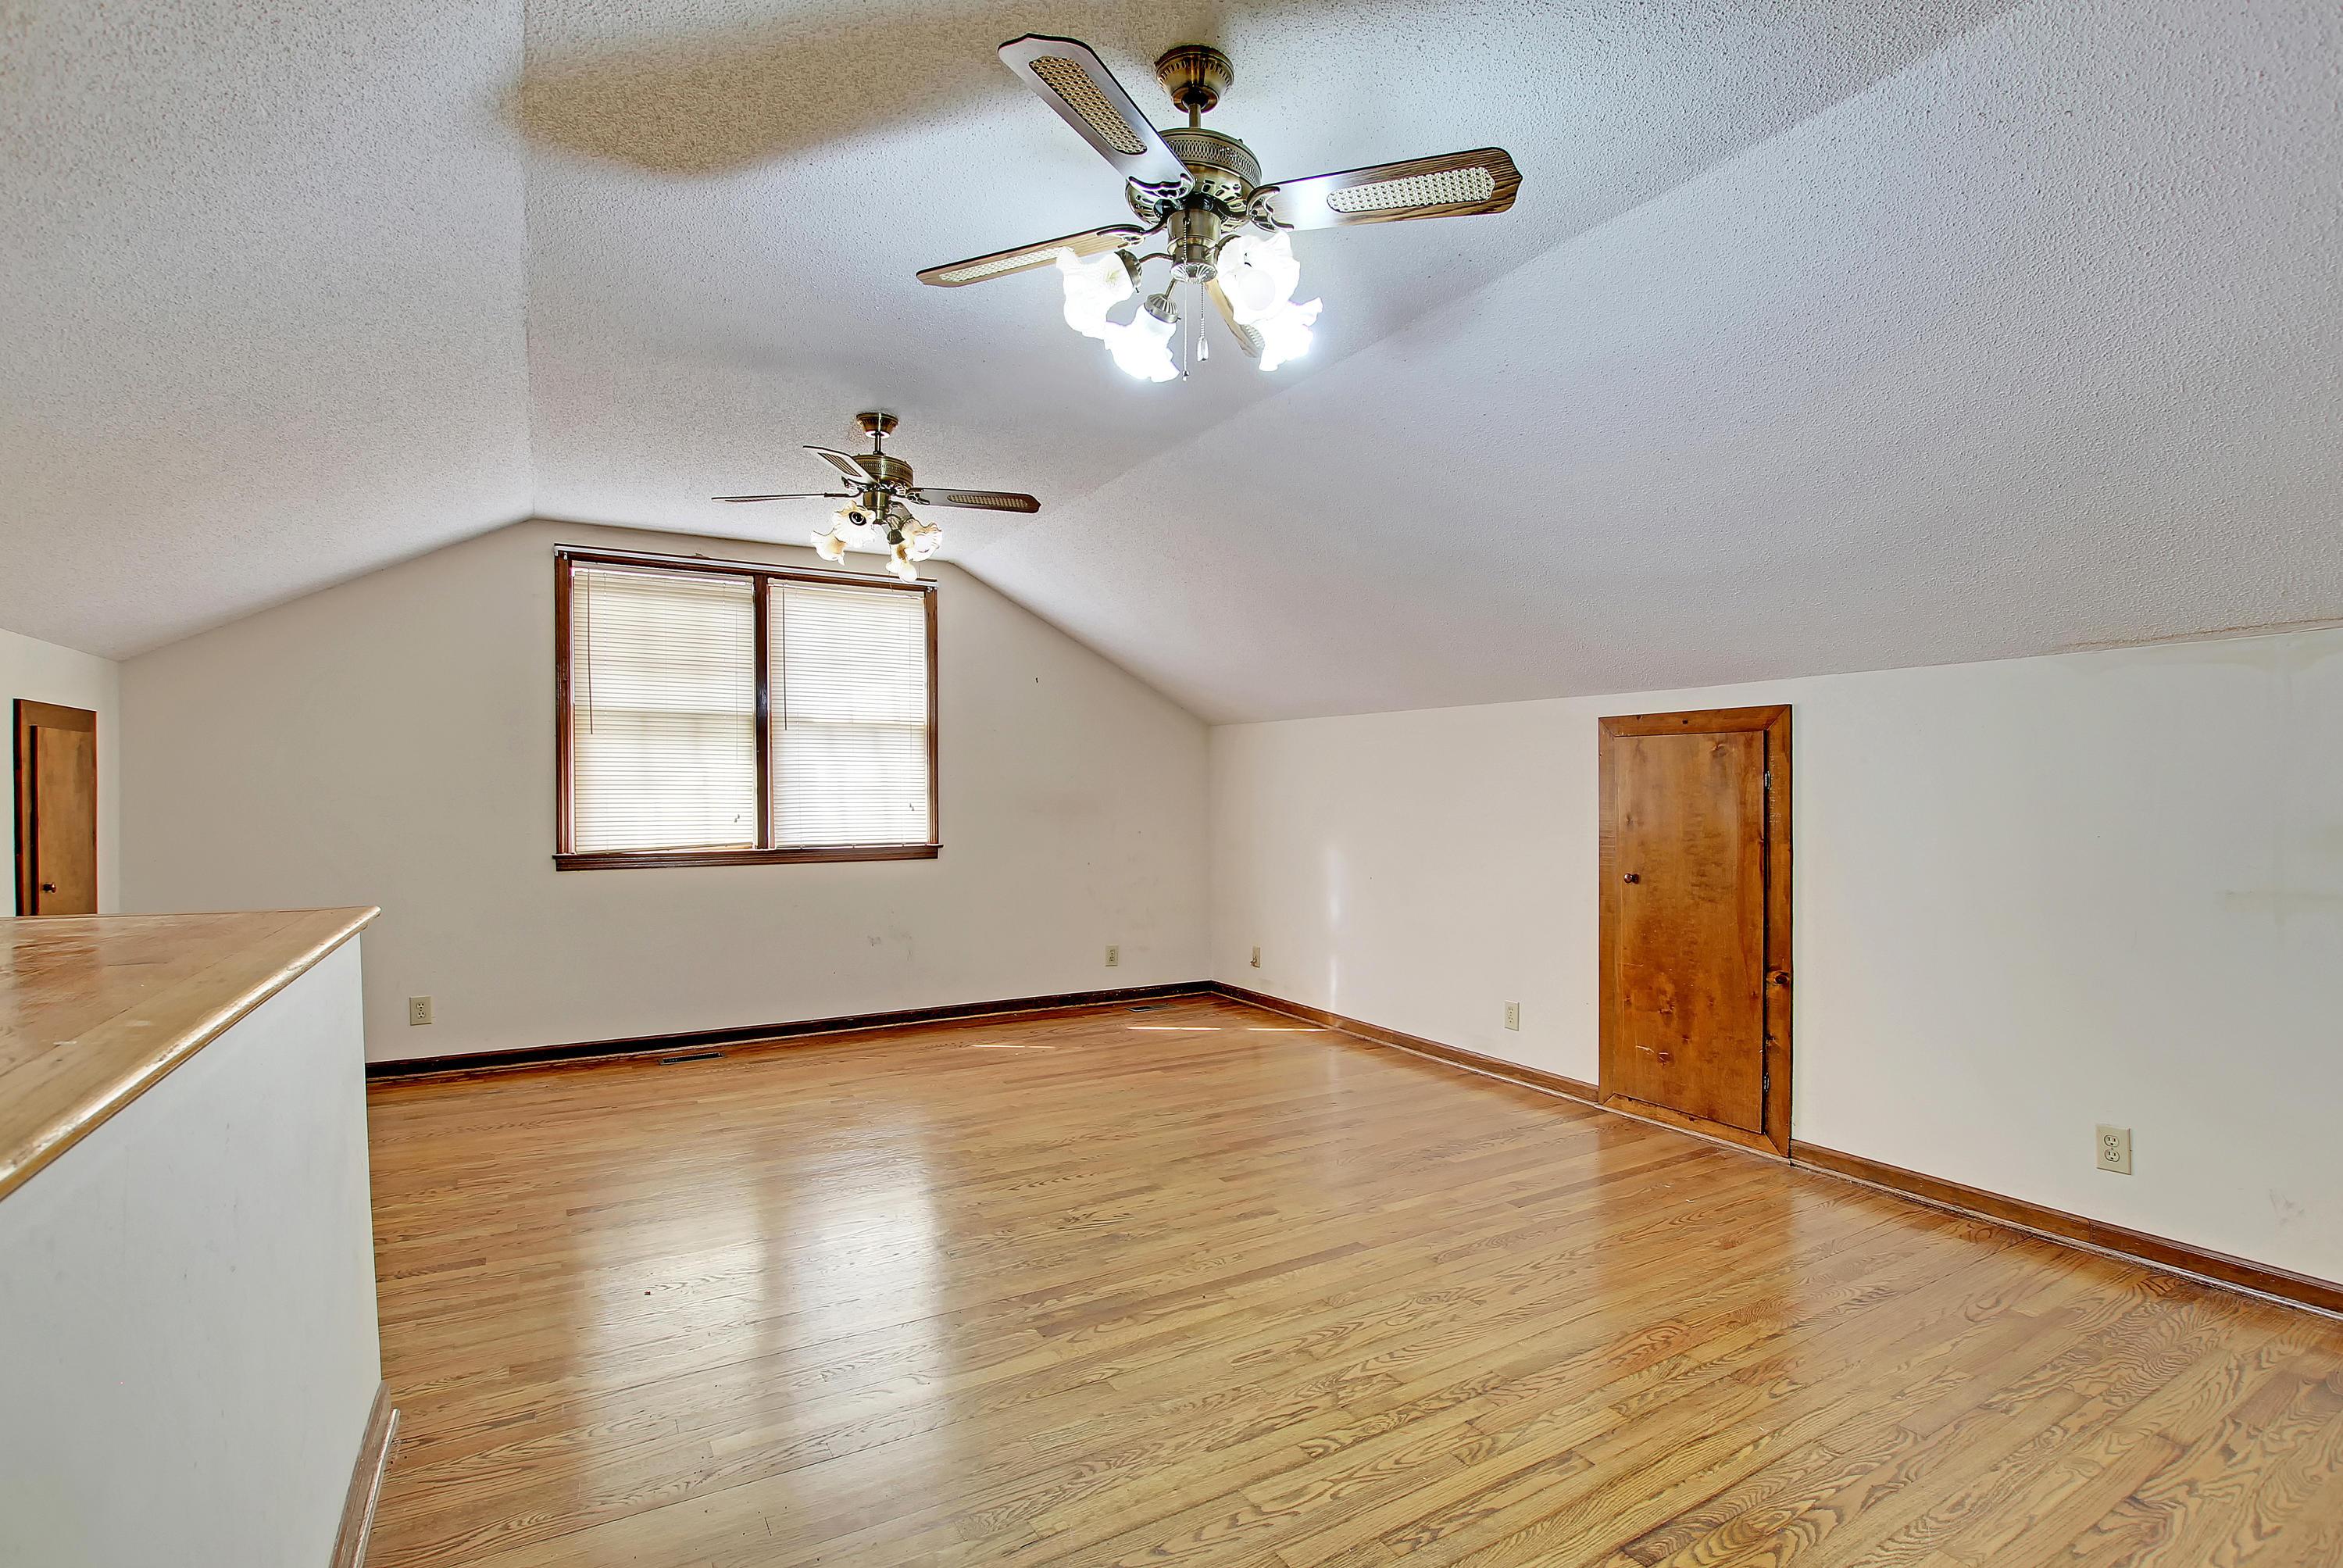 Montclair Homes For Sale - 1509 Montclair, Charleston, SC - 10